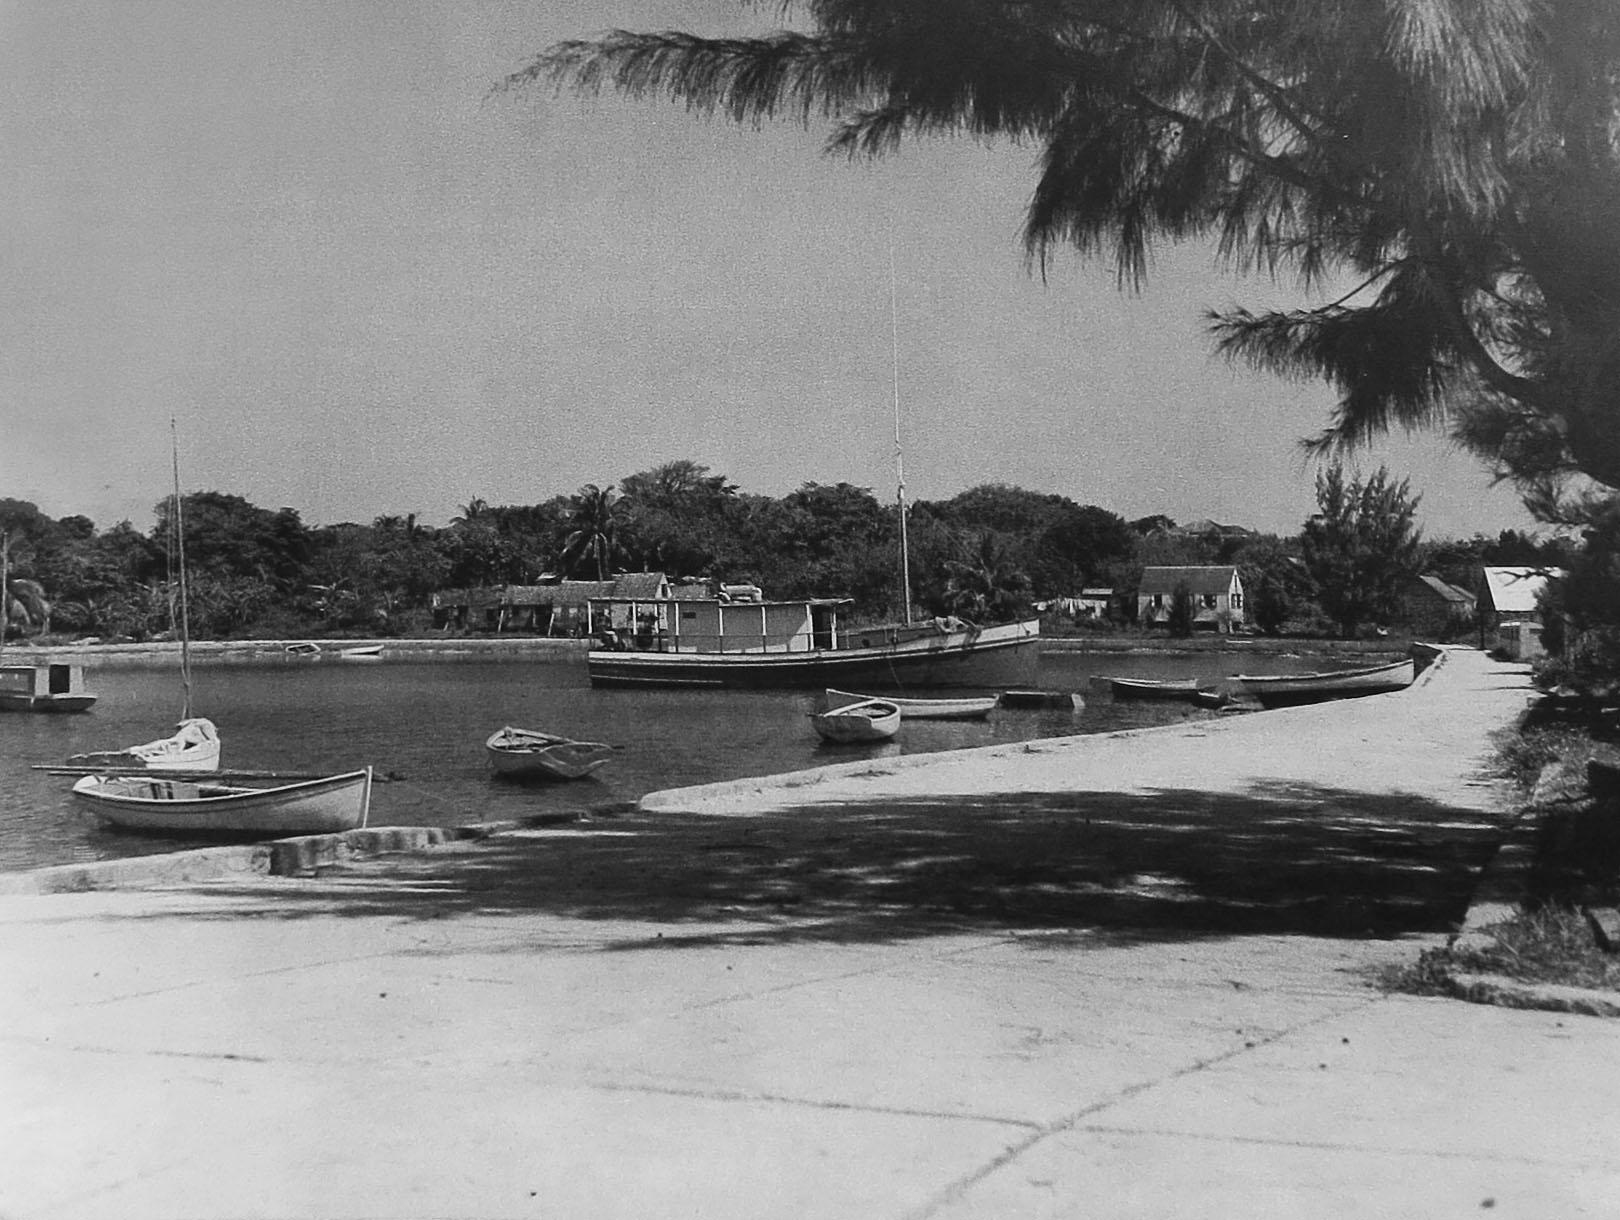 Settlement Creek Waterfront, Green Turtle Cay, Abaco, Bahamas